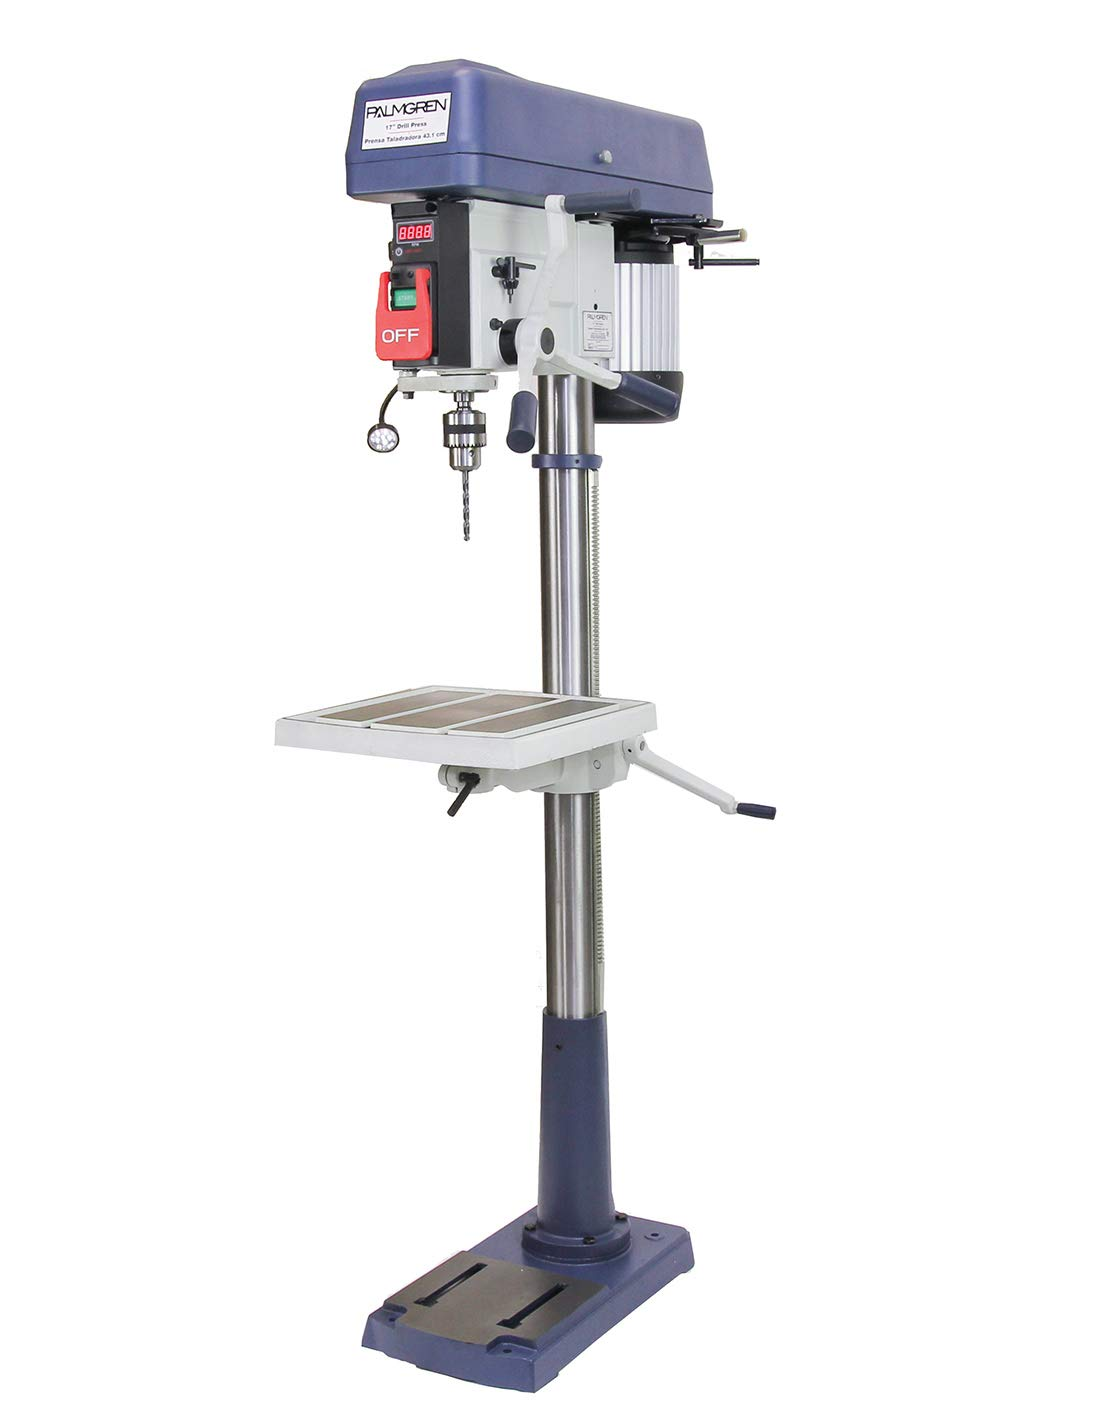 Palmgren 9680177 Heavy Duty 16-Speed Floor Step Pulley Drill Press, 17'' Swing, 1 hp, 120/240V, 1 Phase